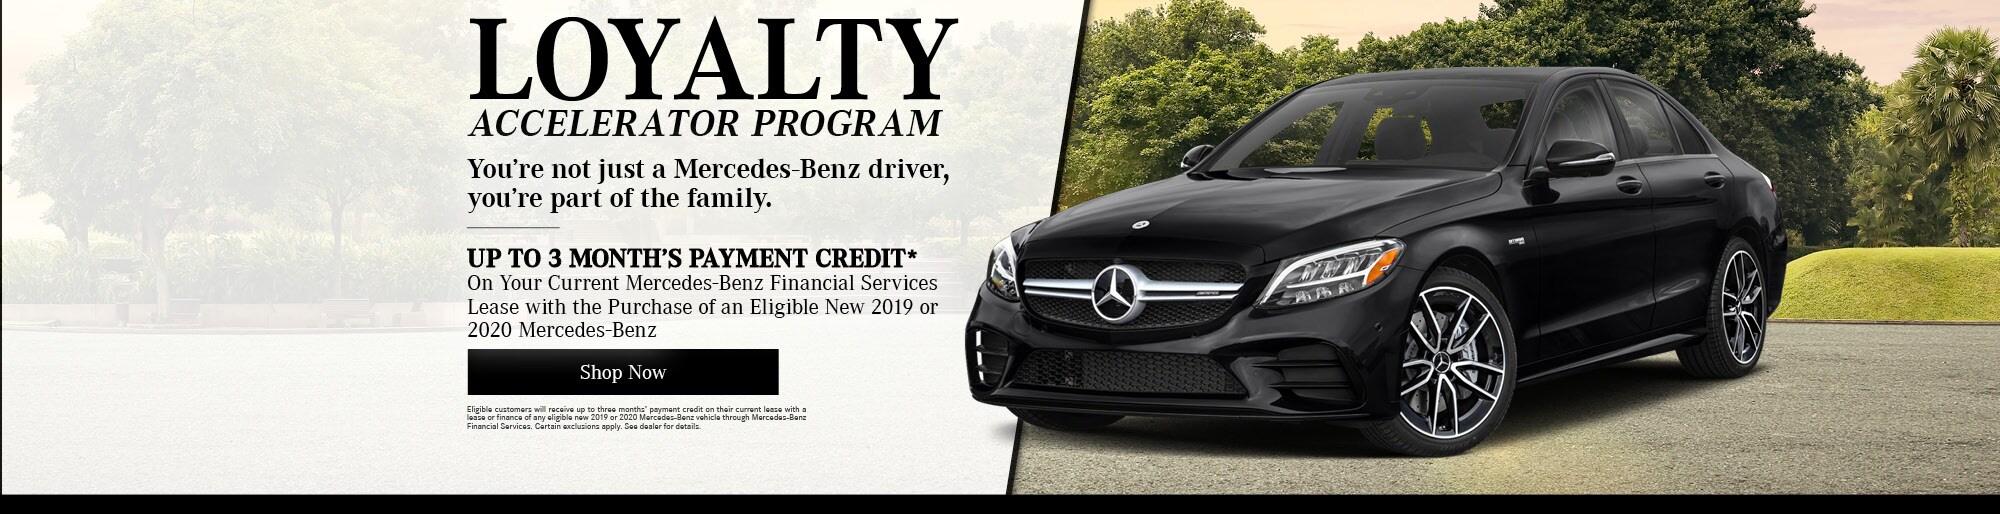 Hendrick Motors of Charlotte Mercedes-Benz Dealership | New & Used Benz